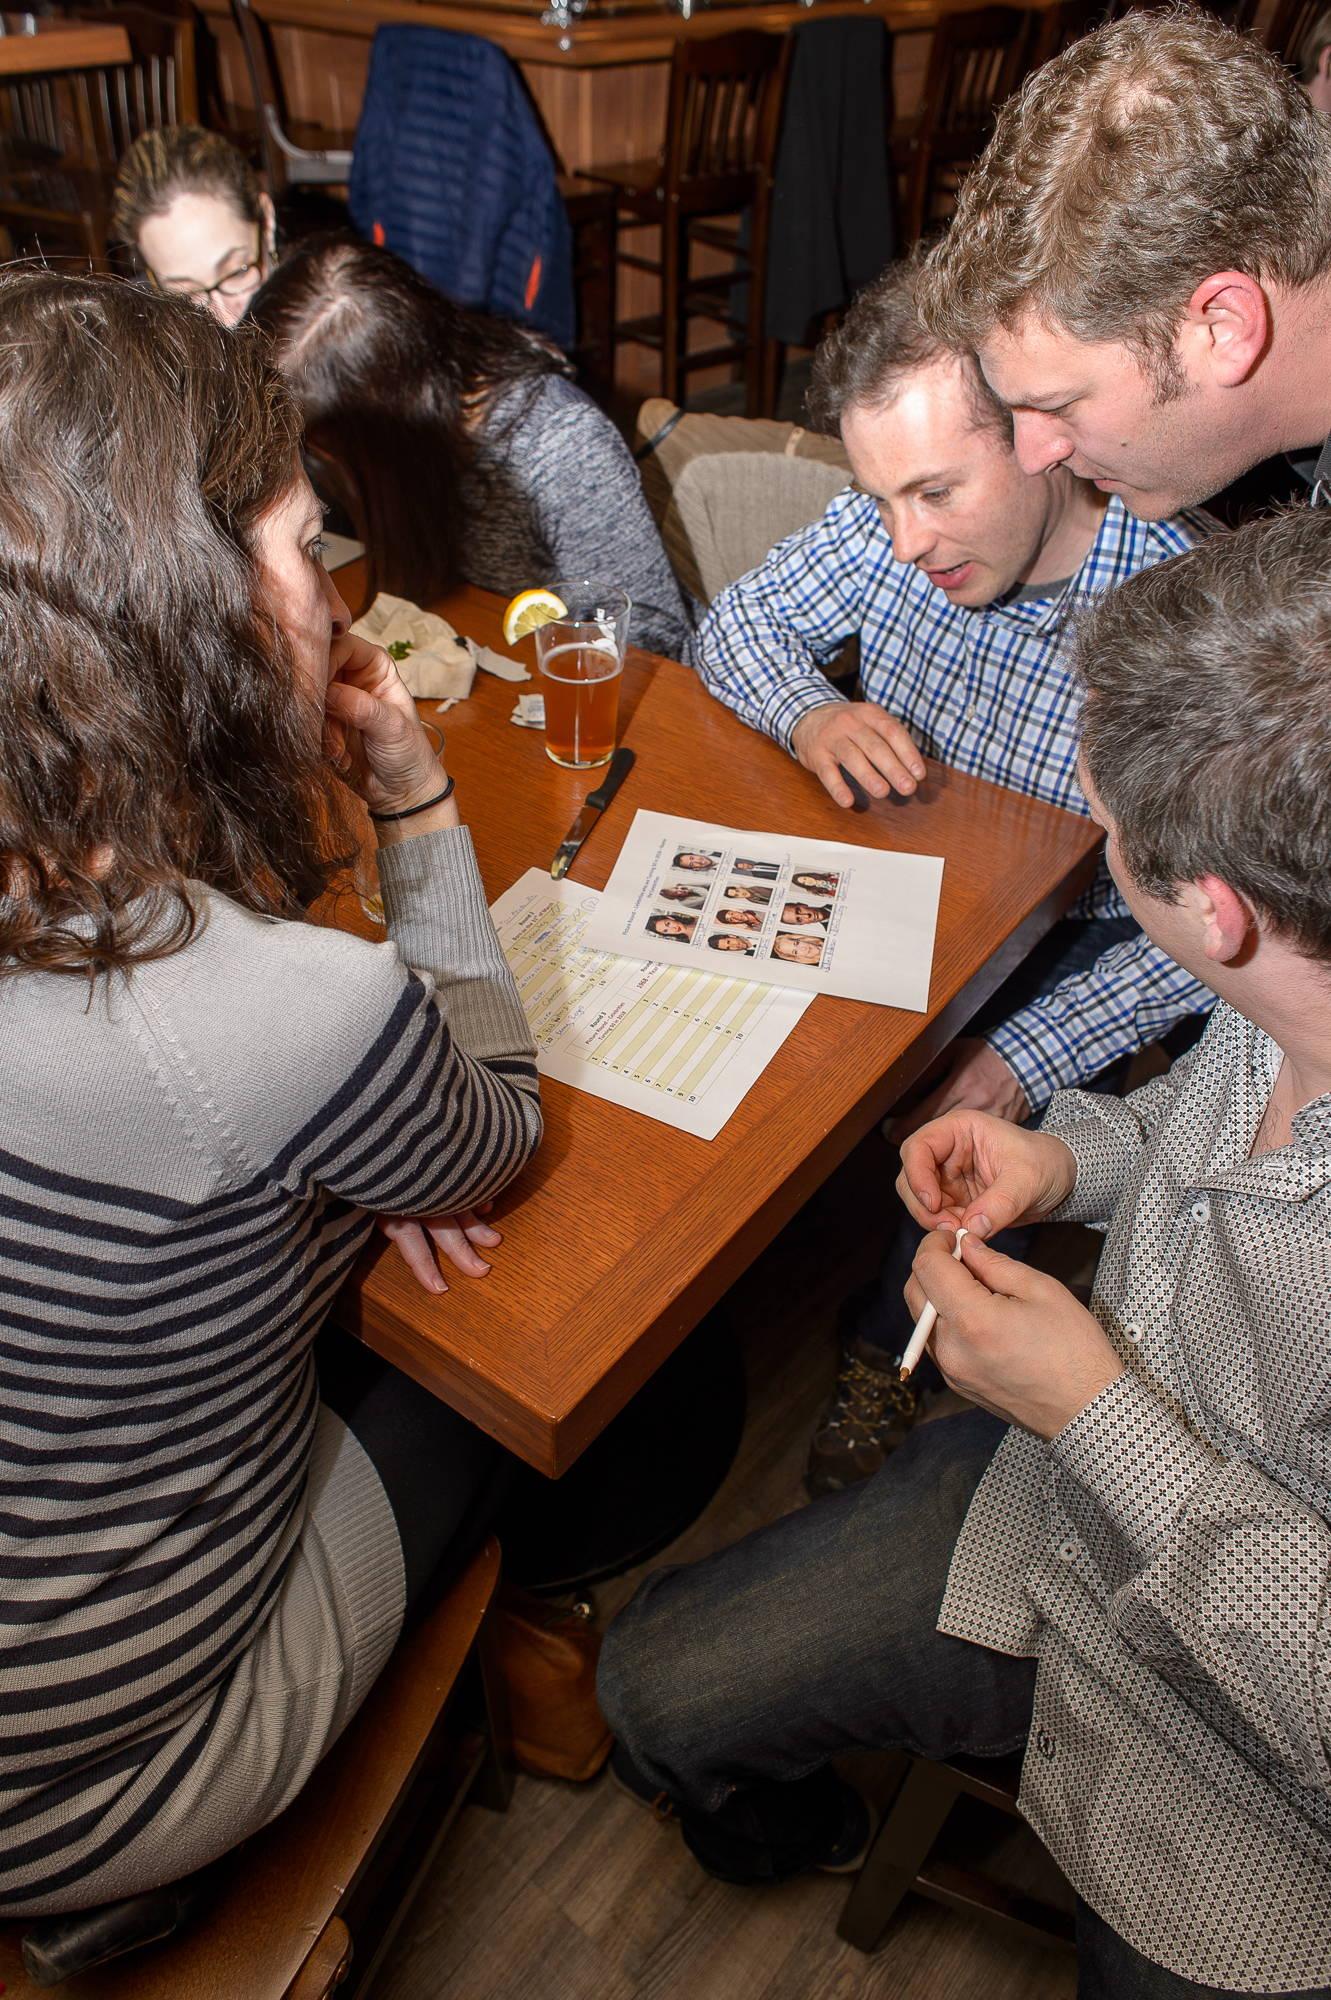 People enjoying a trivia night at a pub